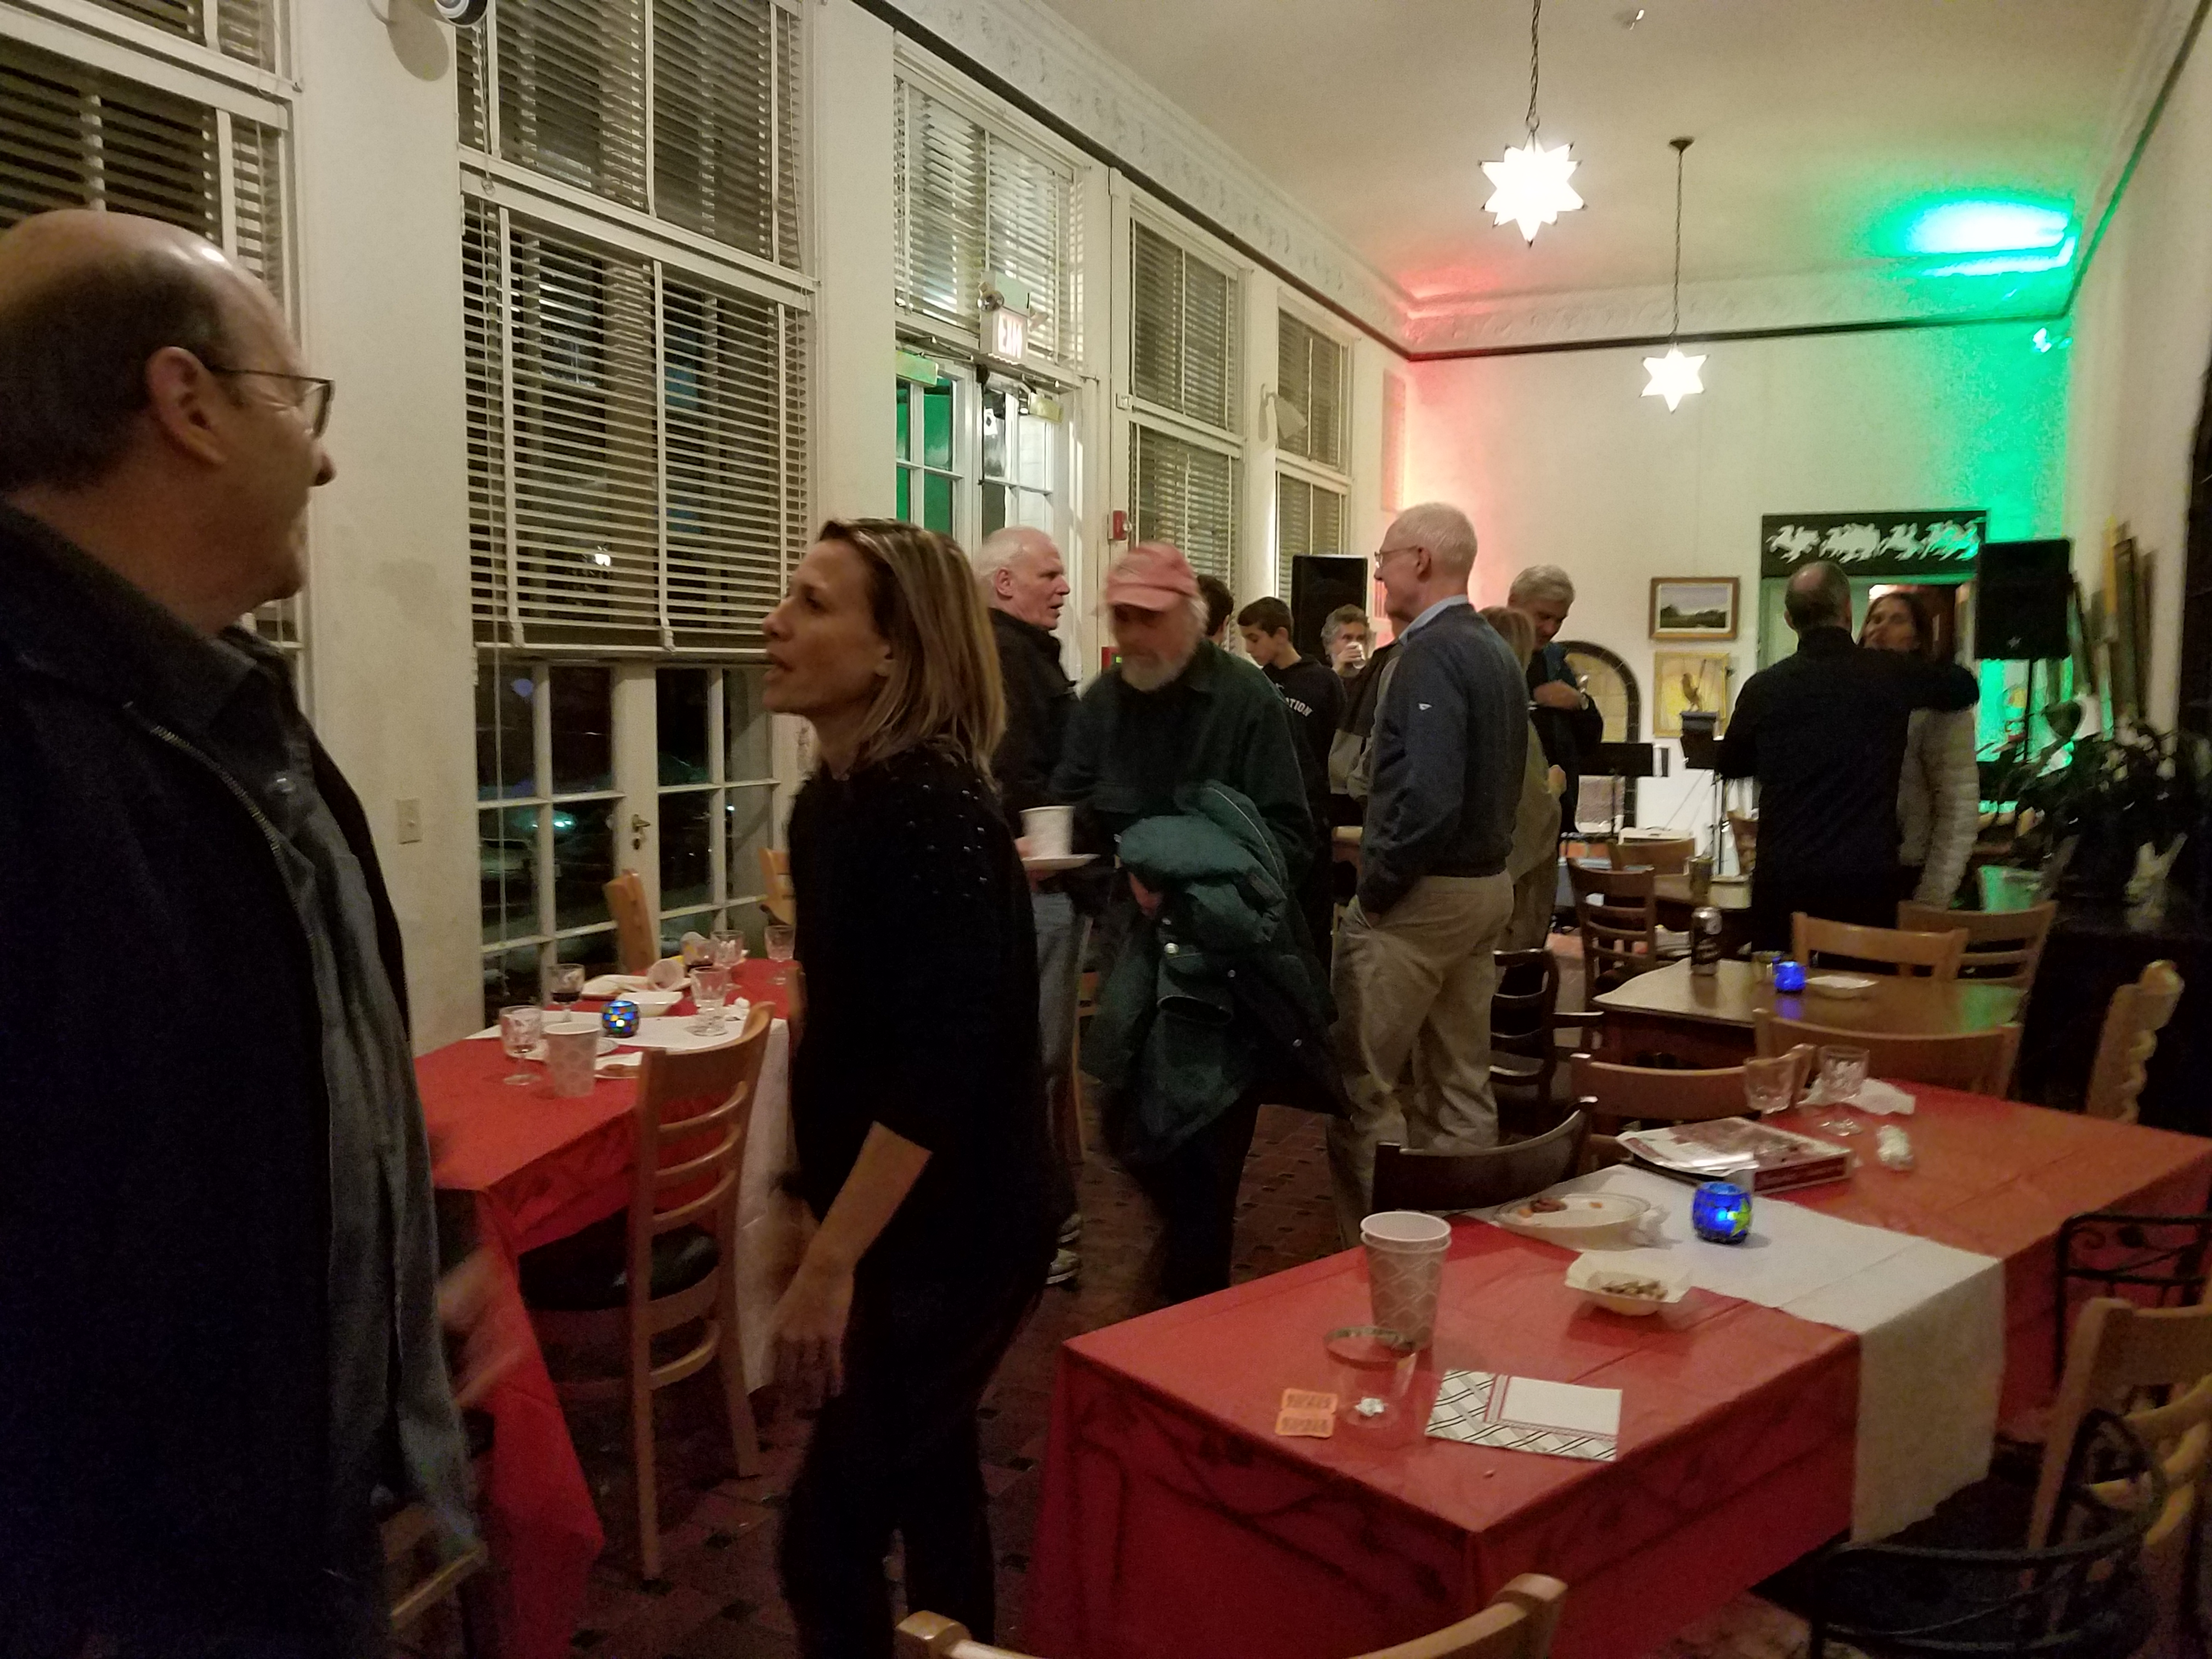 CoffeehousE DECEMBER EVENT 2018 2